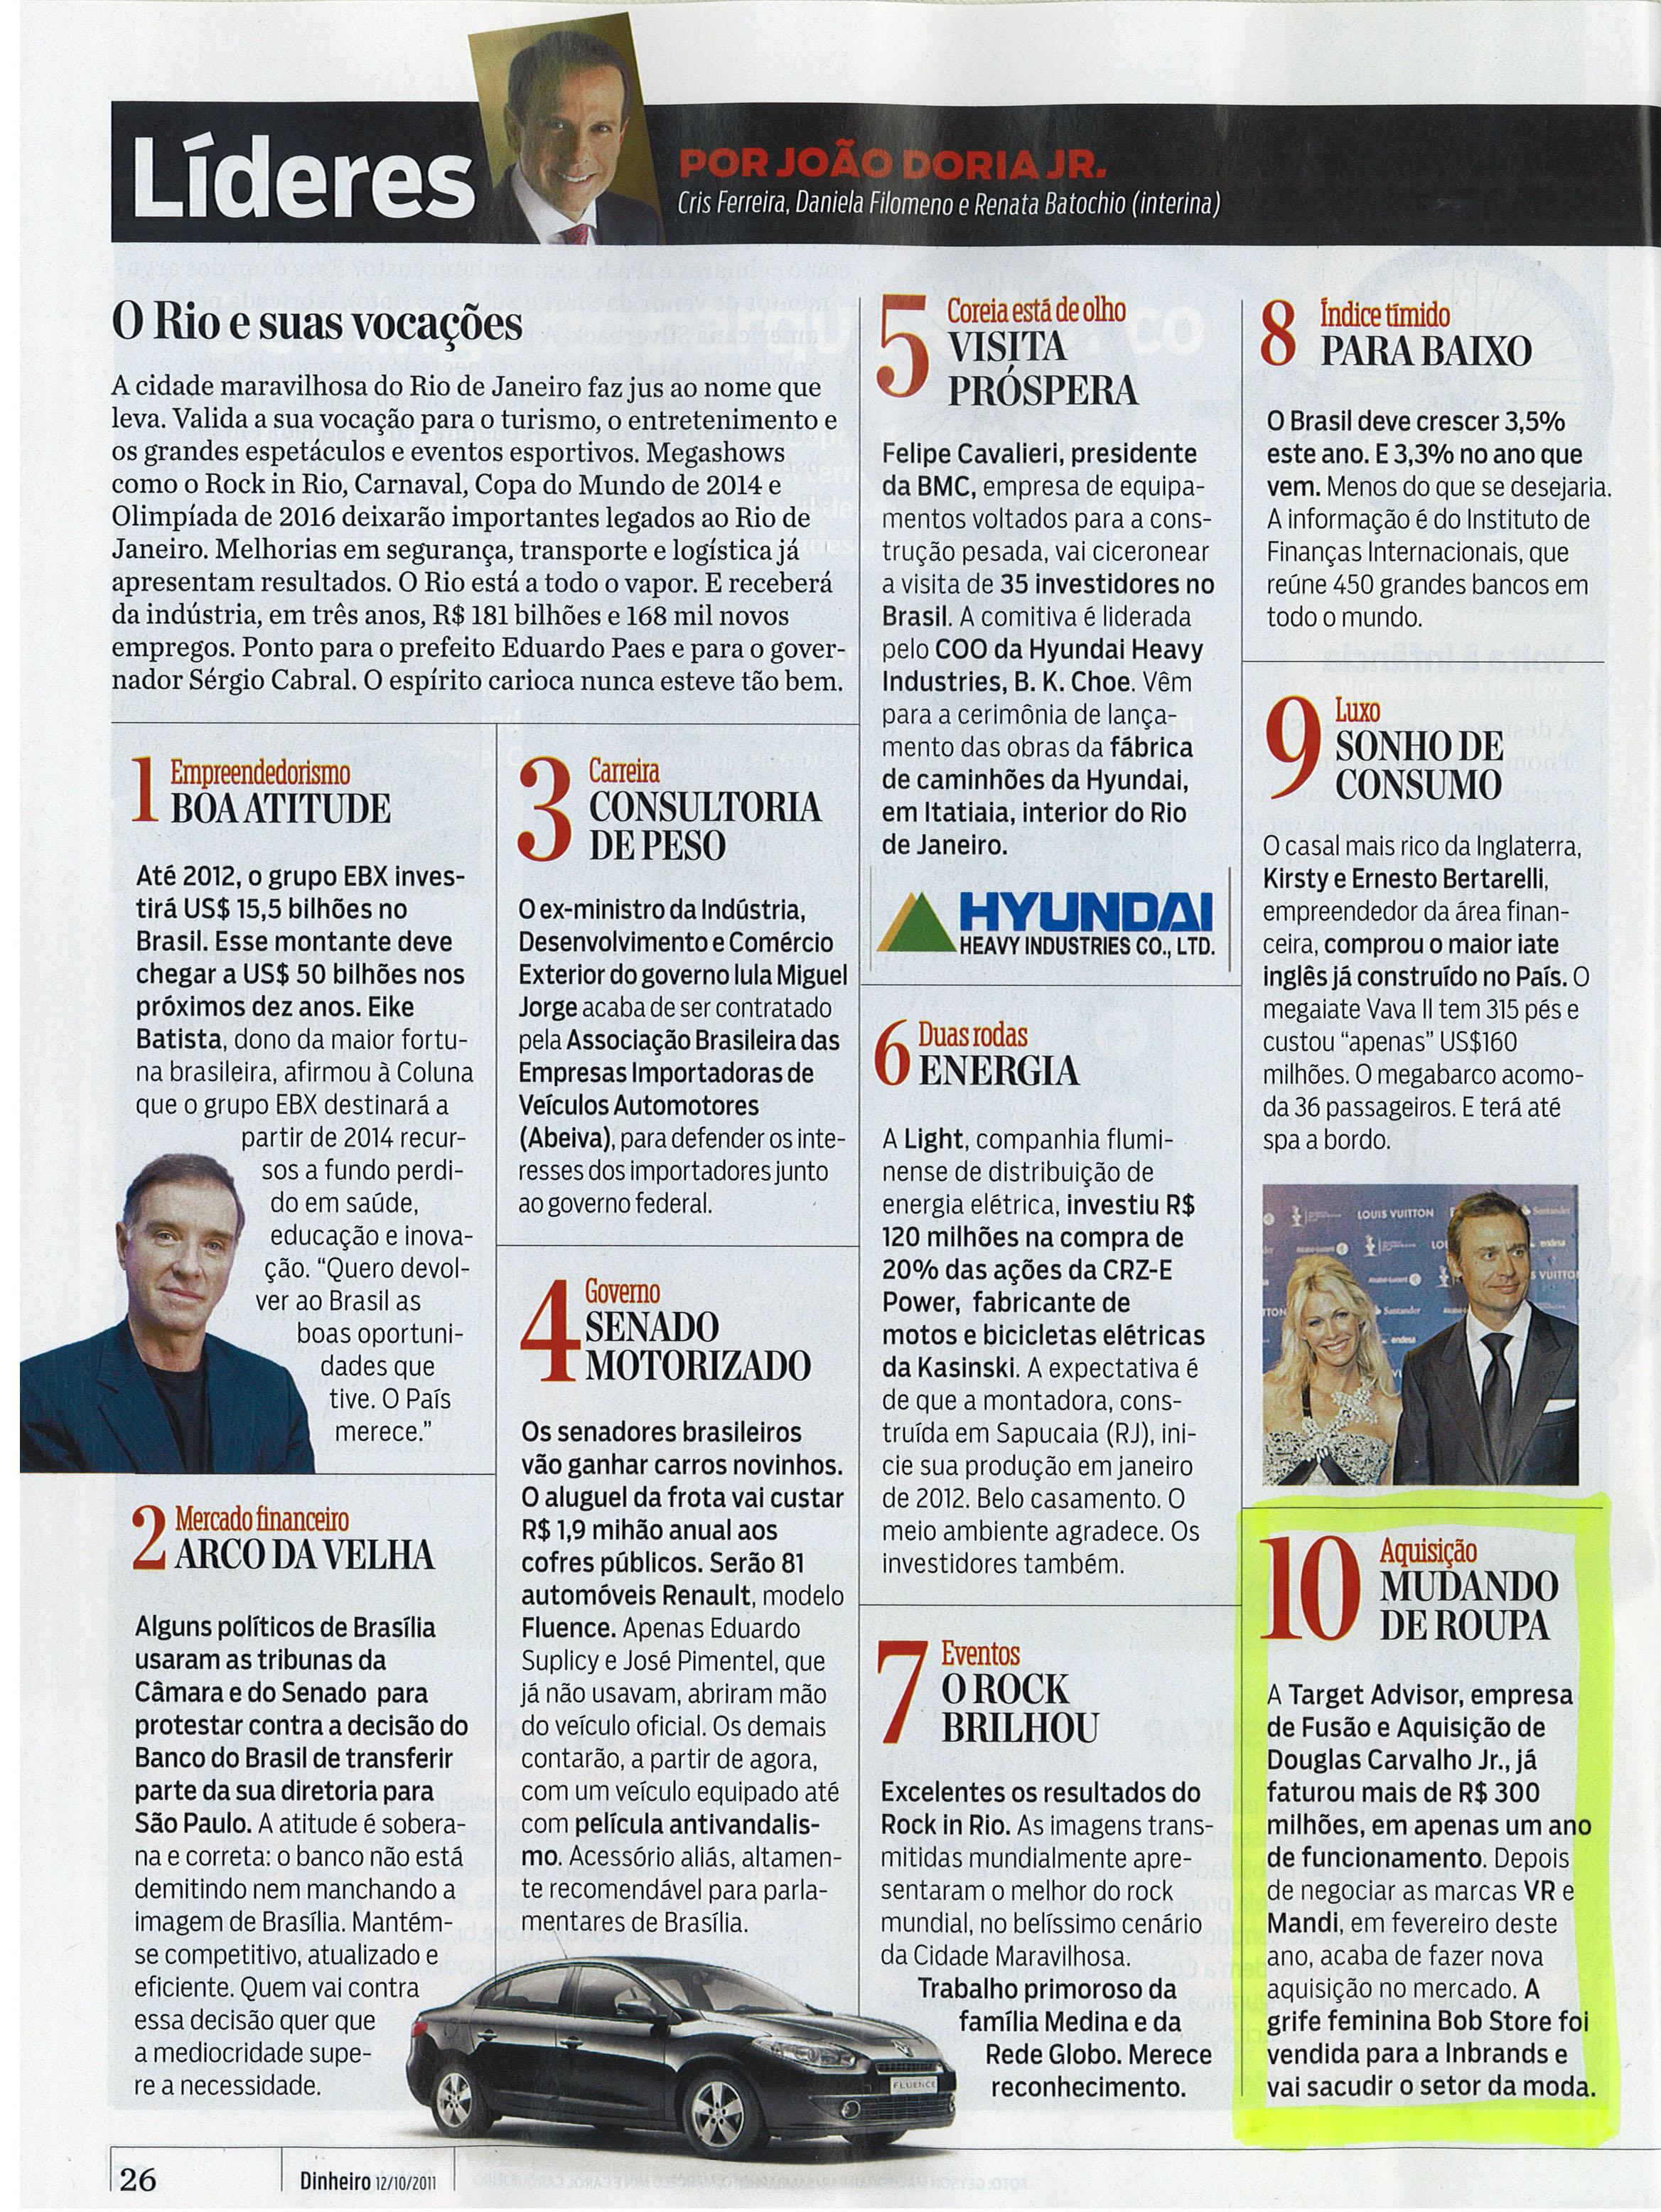 Líderes Top 10